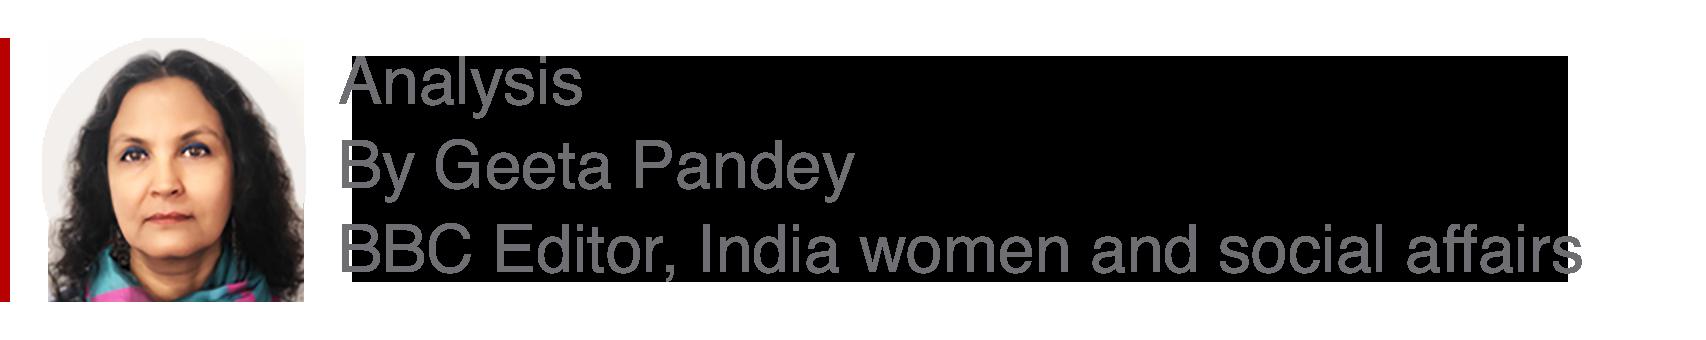 Analysis box by Geeta Pandey, Editor, India women and social affairs